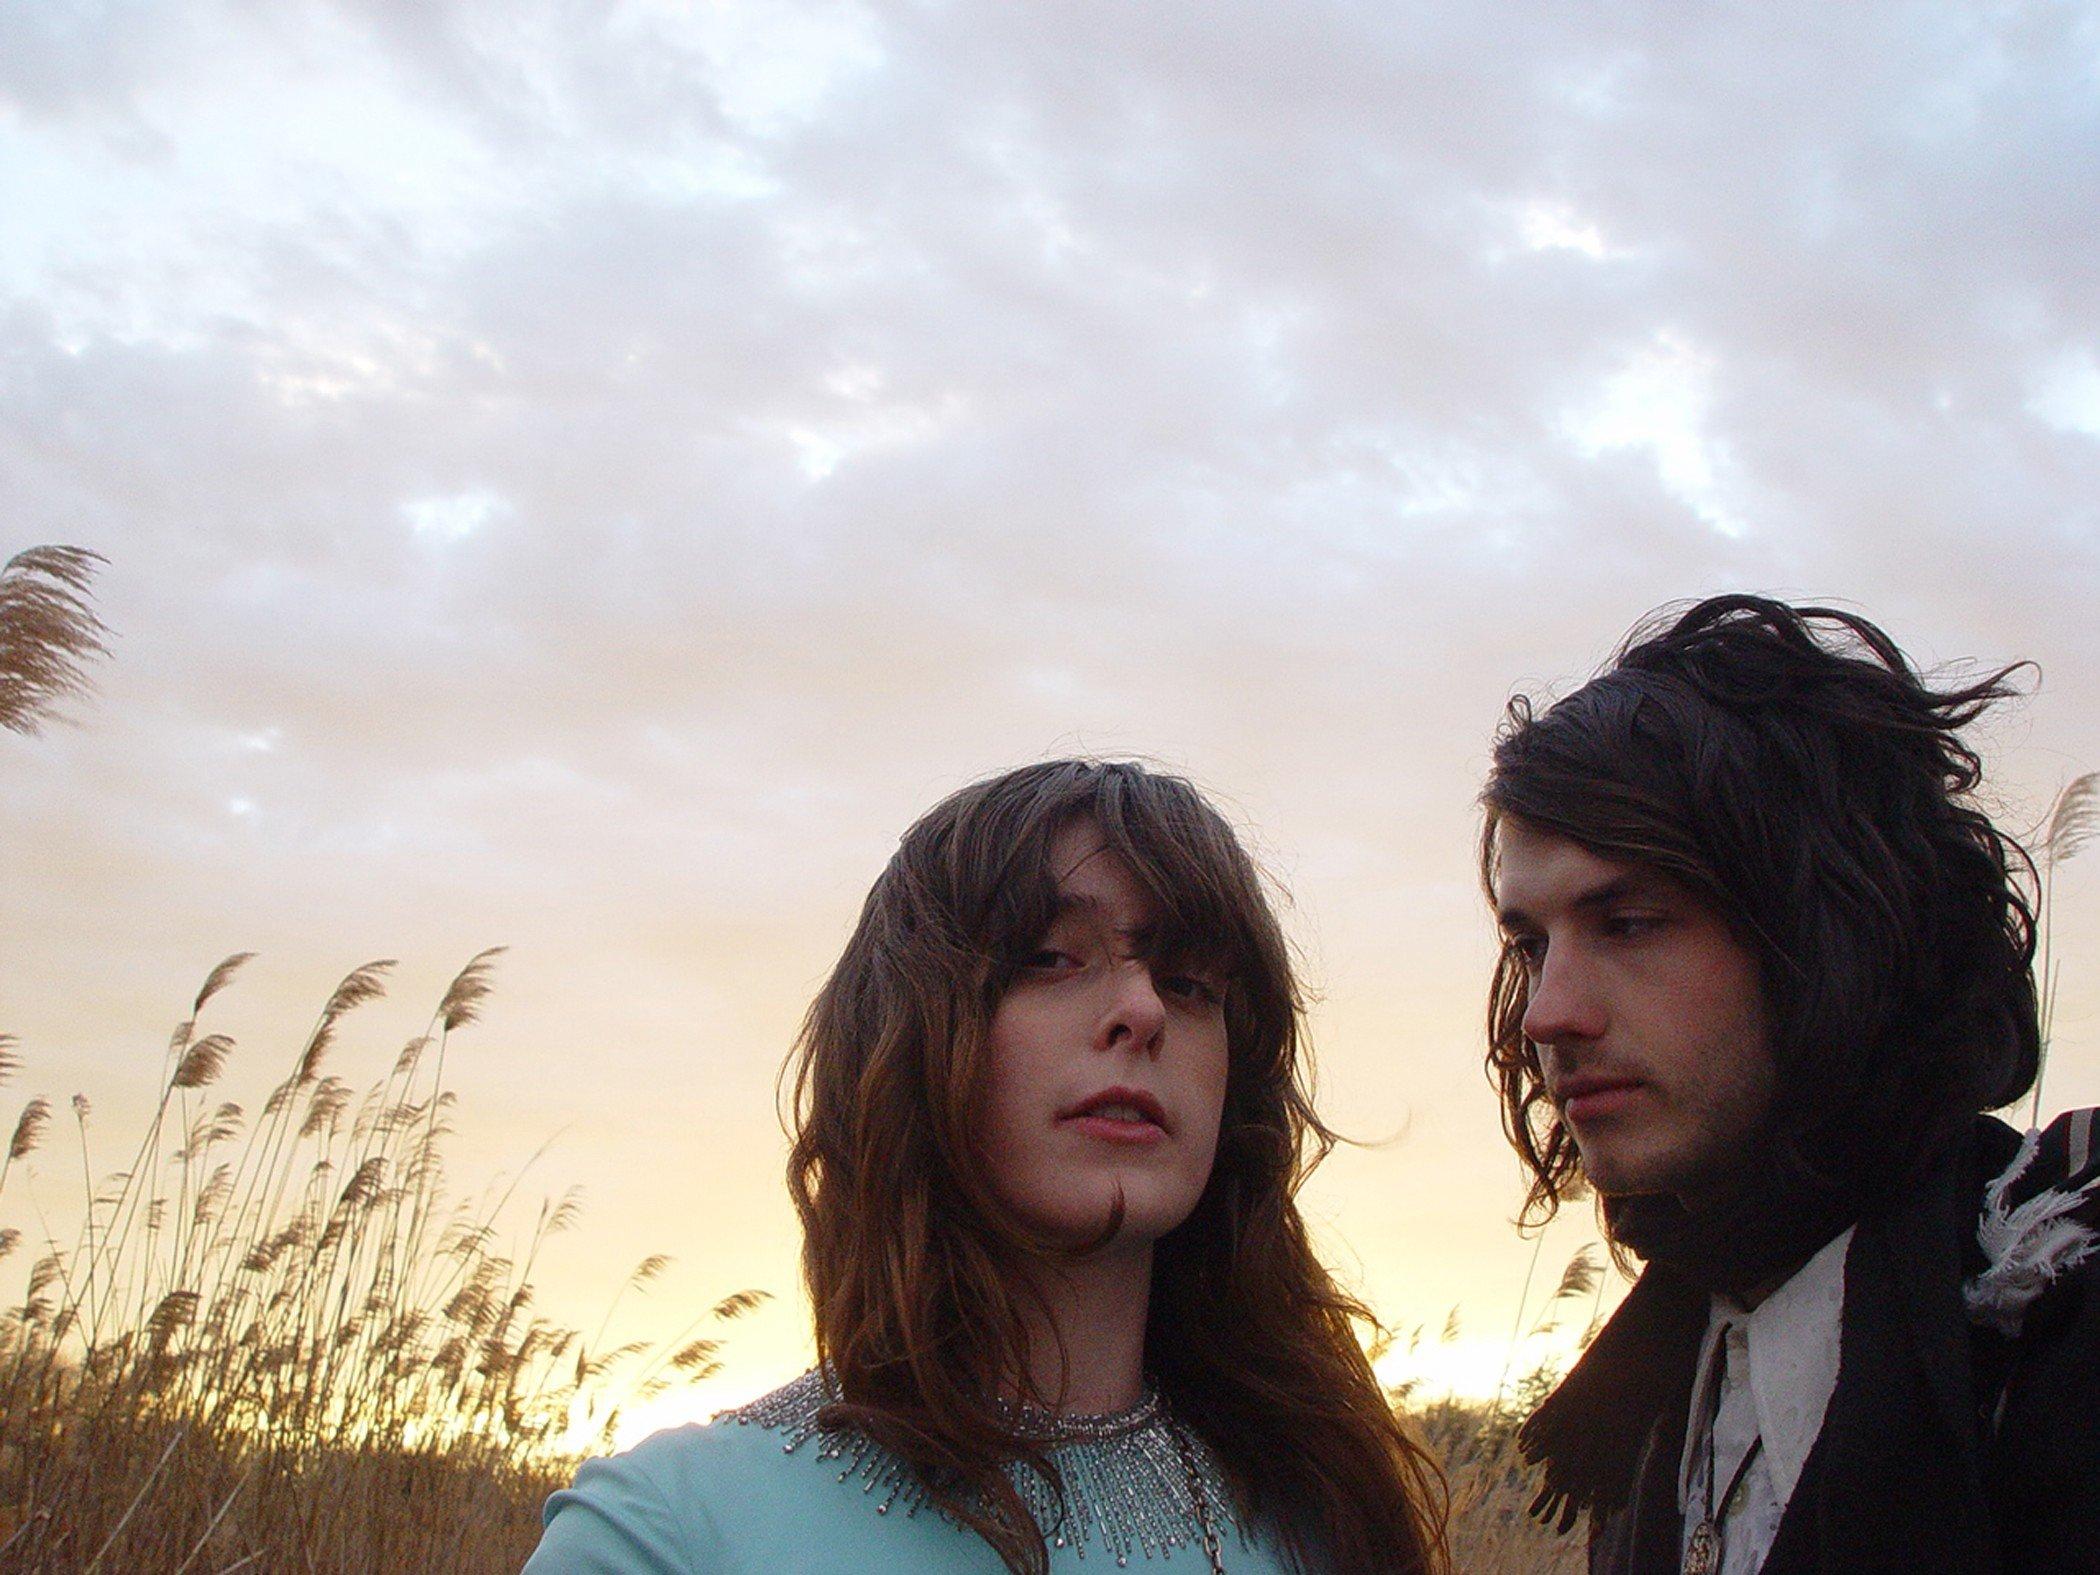 Beach House - Victoria Legrand and Alex Scally